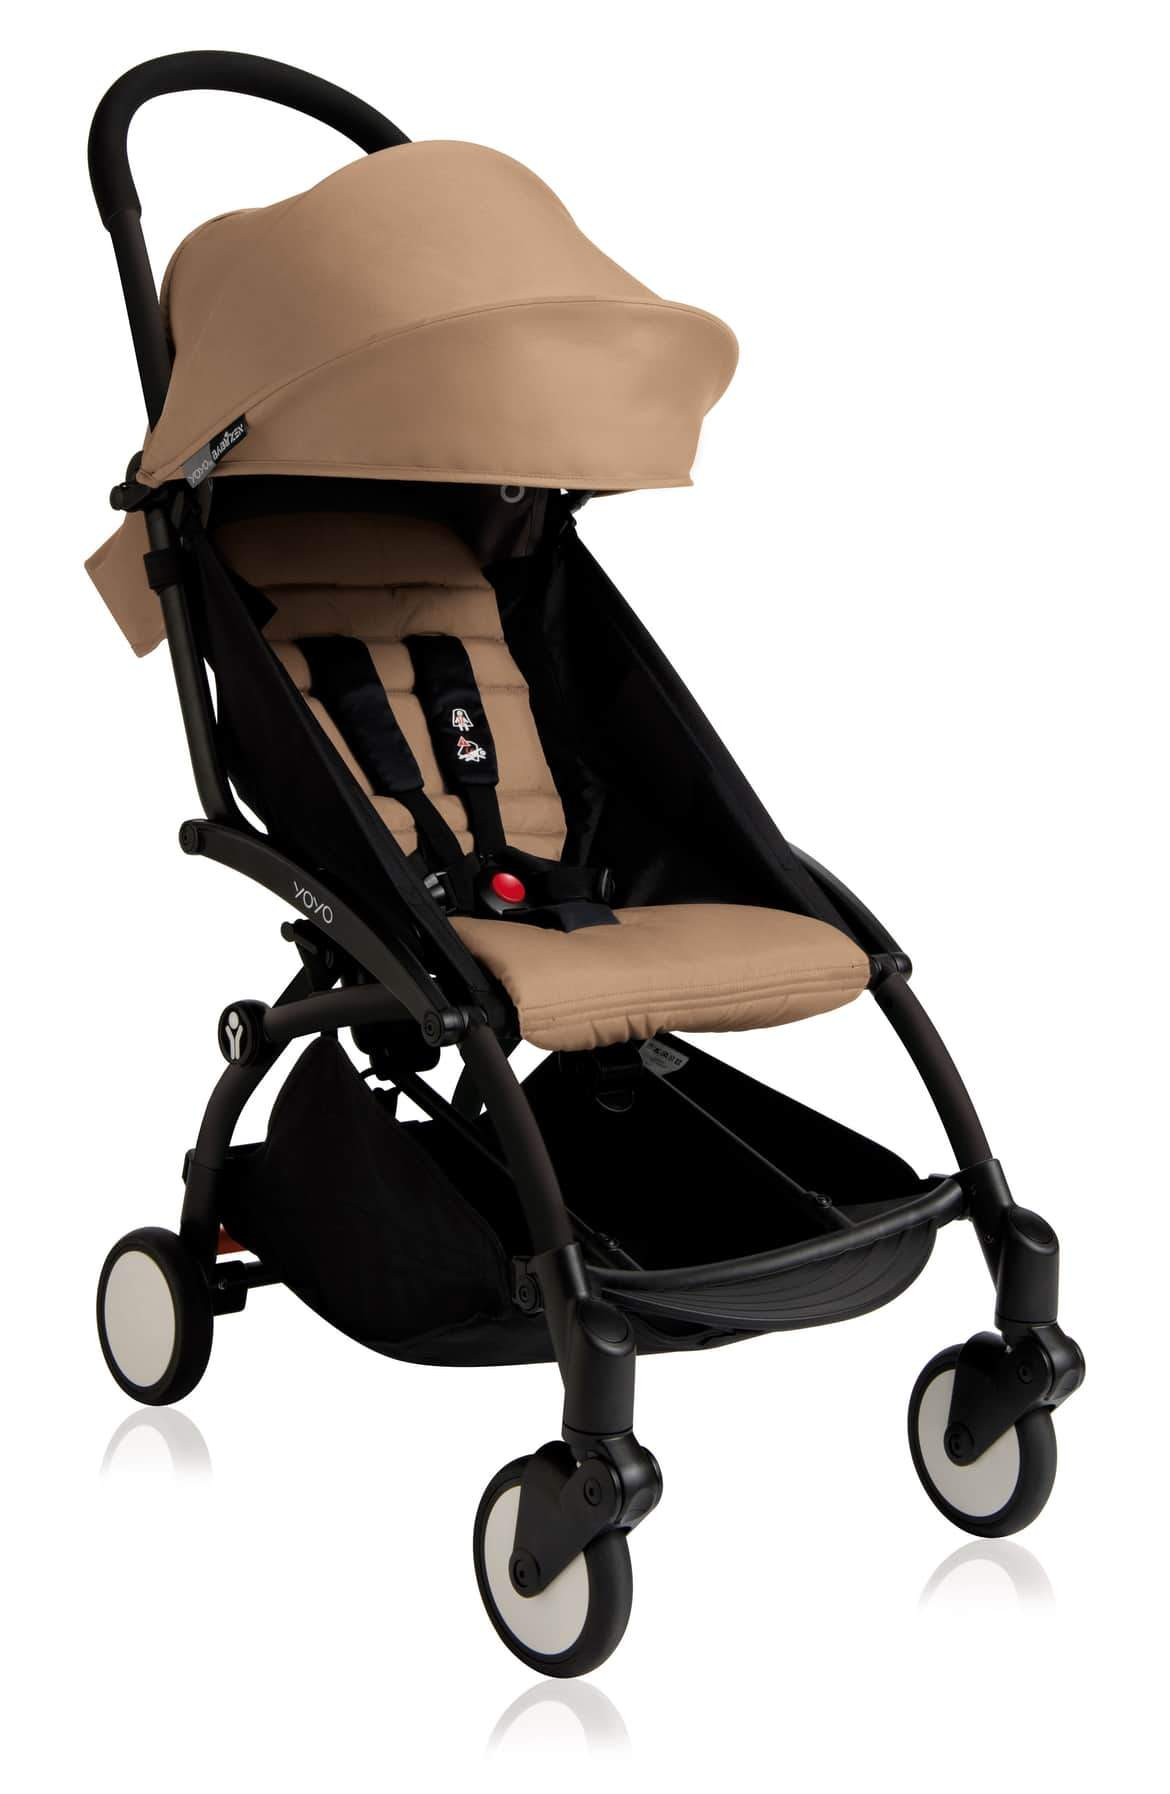 Stroller Black Frame Taupe BabyZen 2018 Yoyo